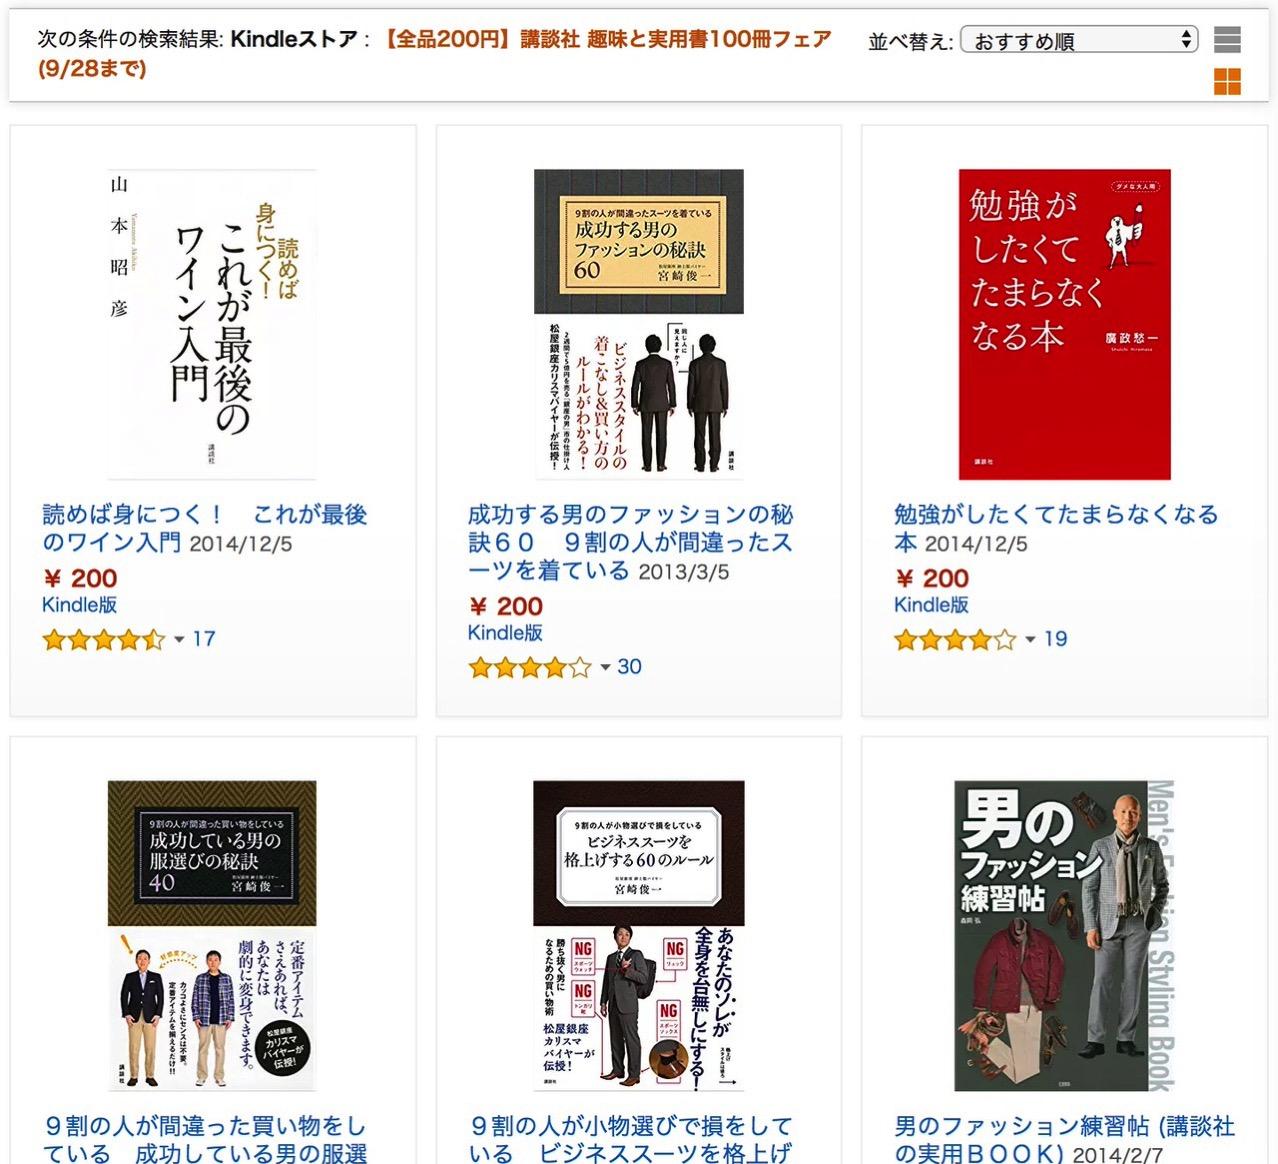 【Kindleセール】全品200円「講談社 趣味と実用書100冊フェア」(9/28まで)